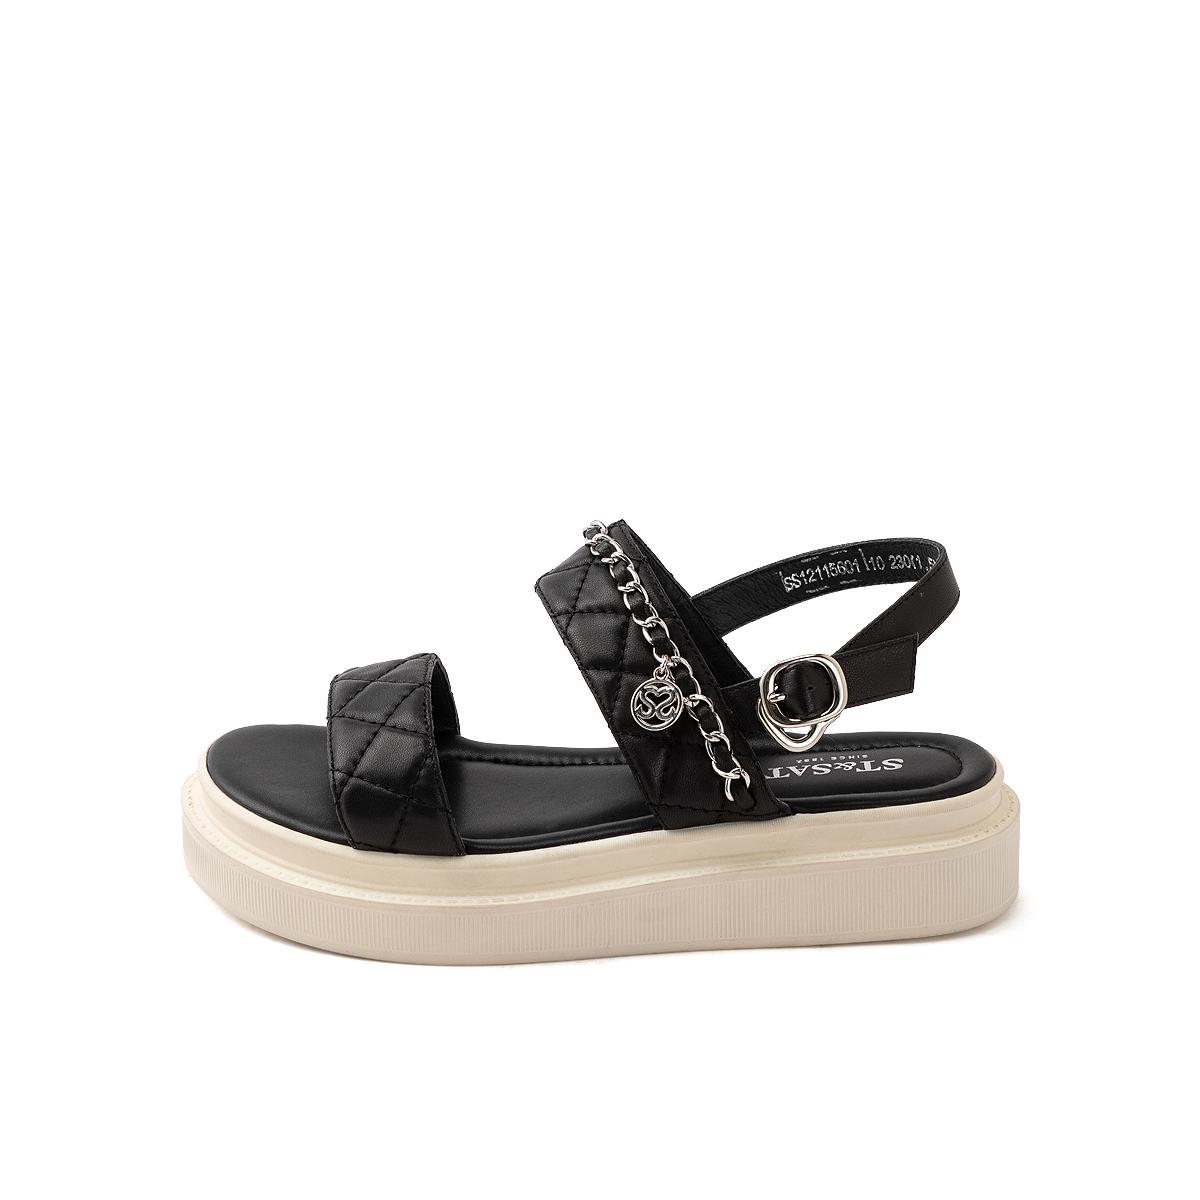 SS12115601 夏季新款露趾搭扣简约女鞋 2021 星期六运动凉鞋羊皮凉鞋